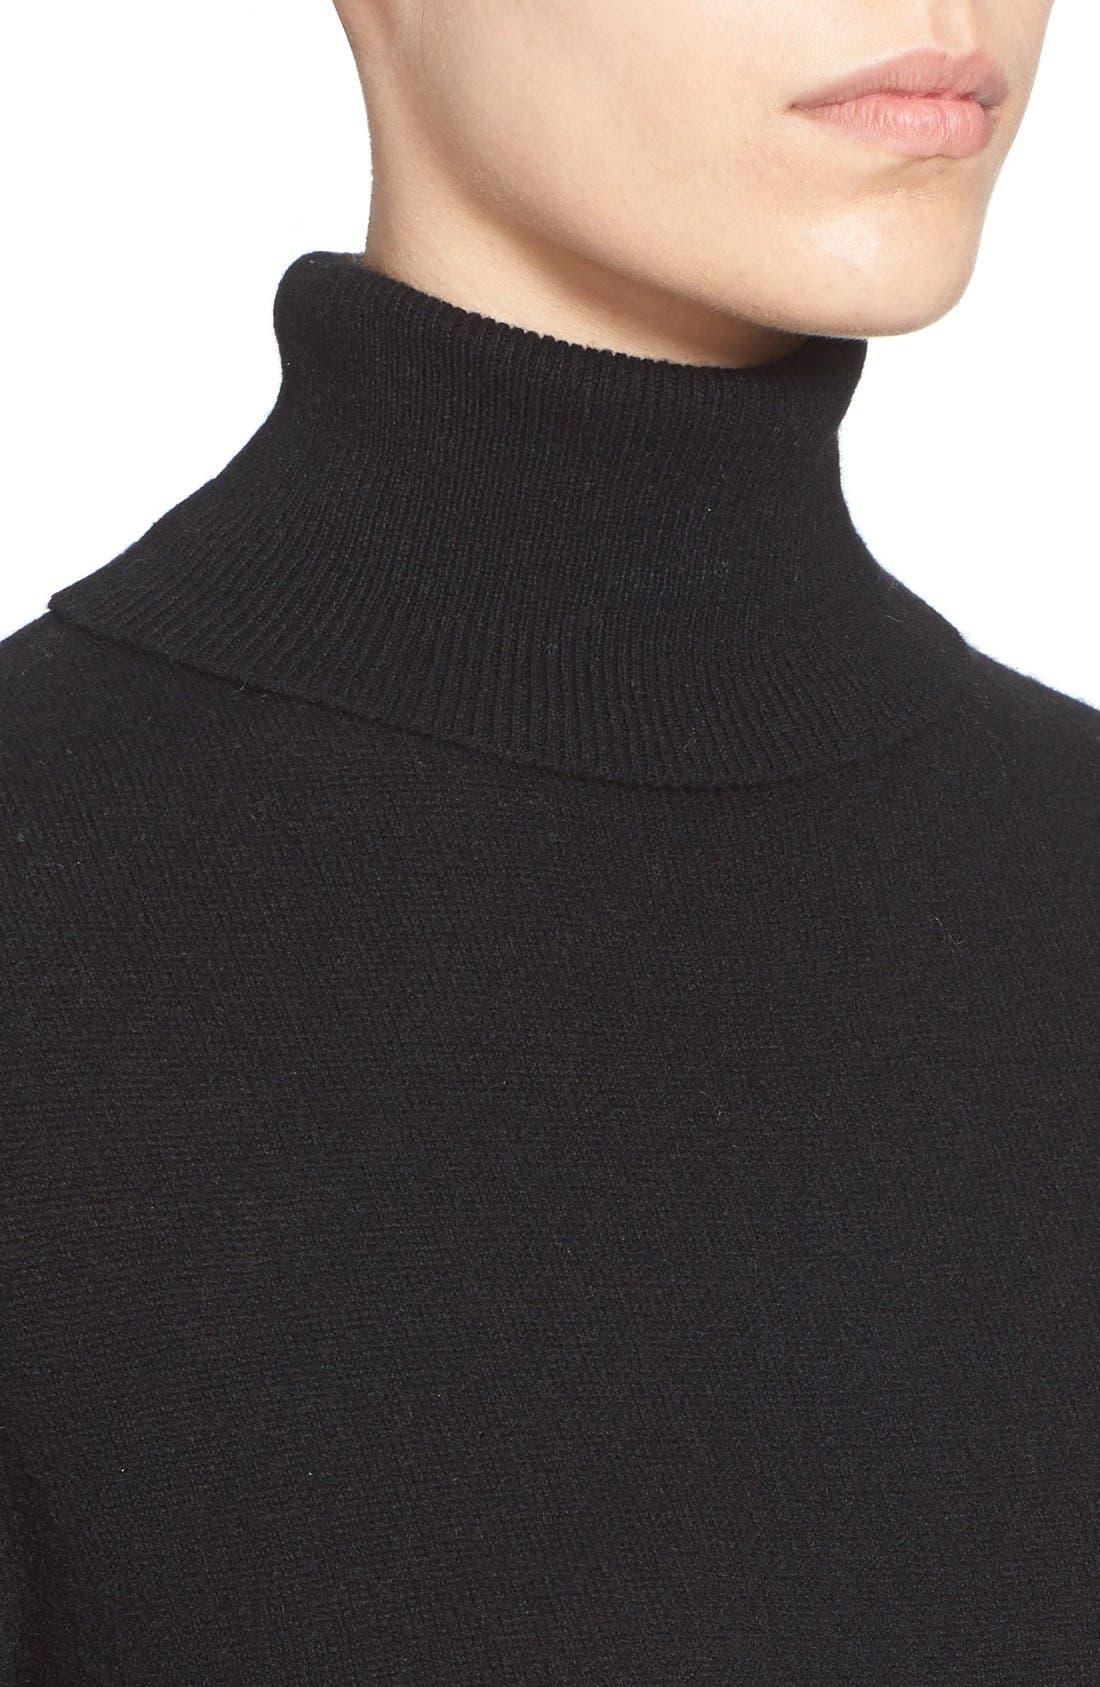 'Oscar' Turtleneck Sweater Dress,                             Alternate thumbnail 4, color,                             Black